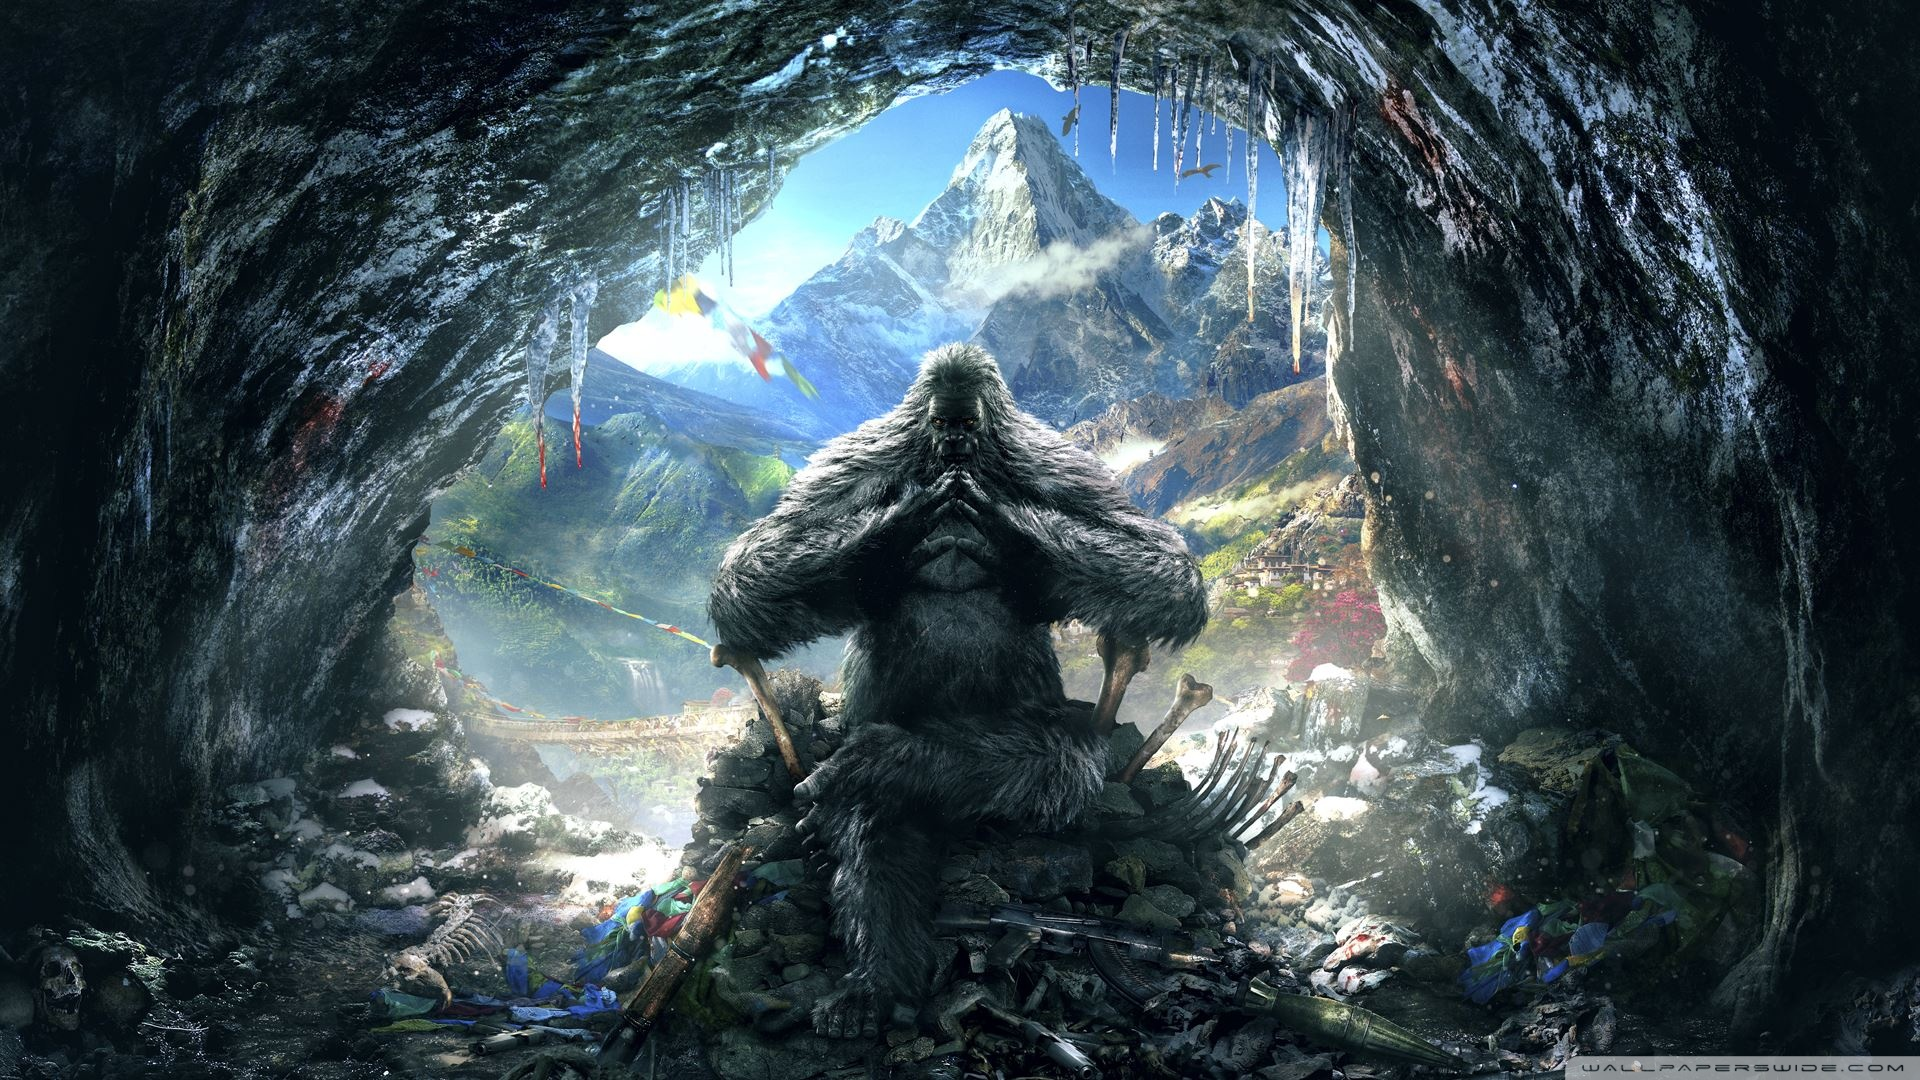 Far Cry 4 Yeti Ultra Hd Desktop Background Wallpaper For 4k Uhd Tv